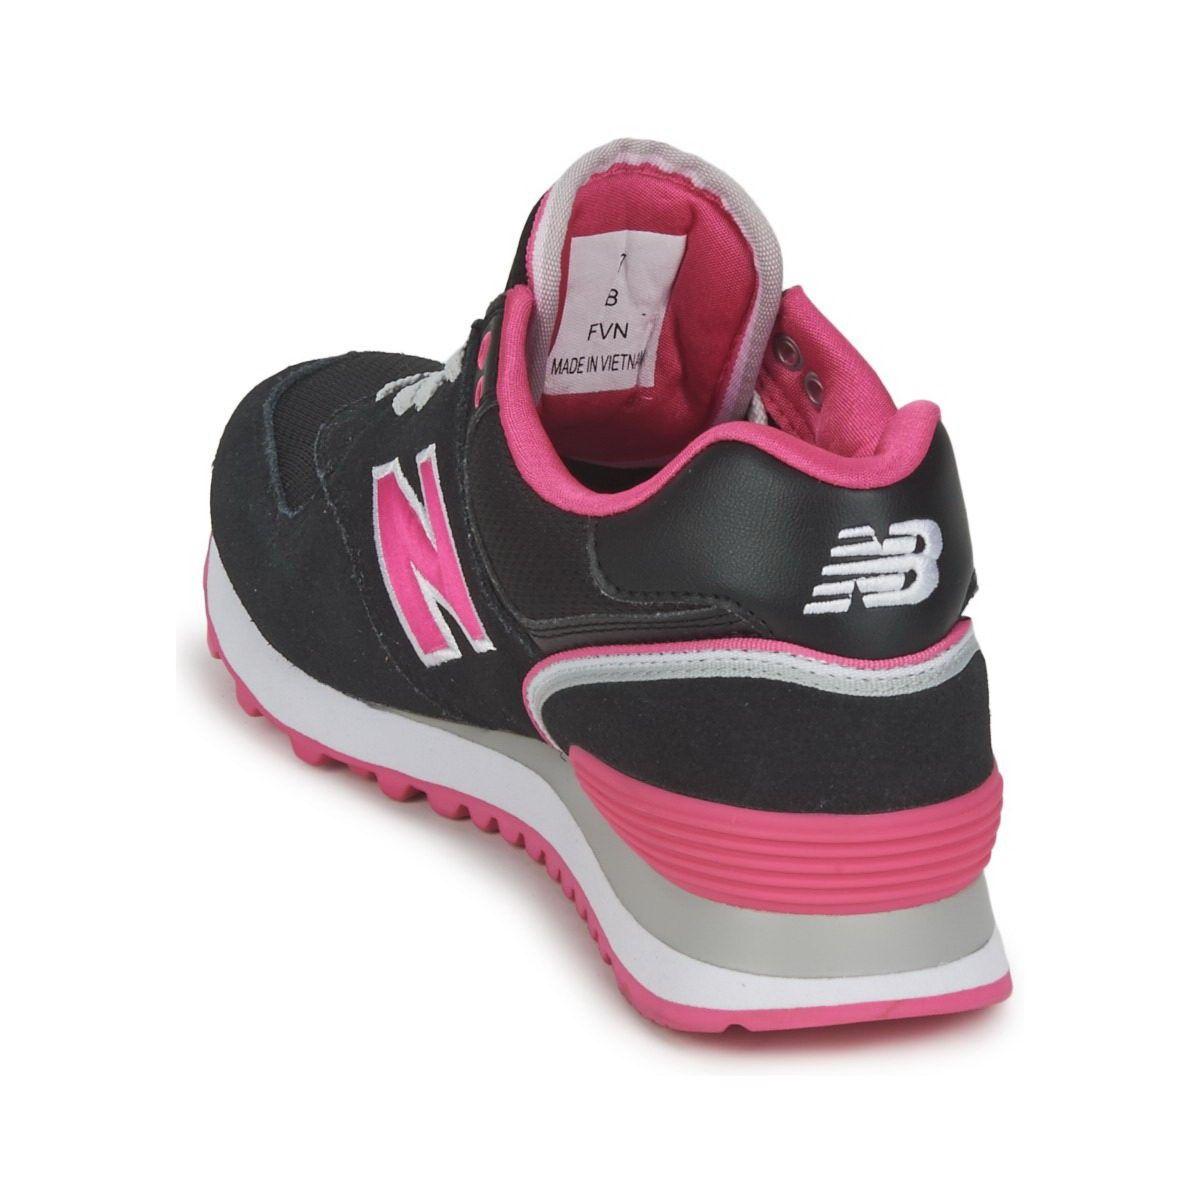 New Balance 574 Women's Black Pink